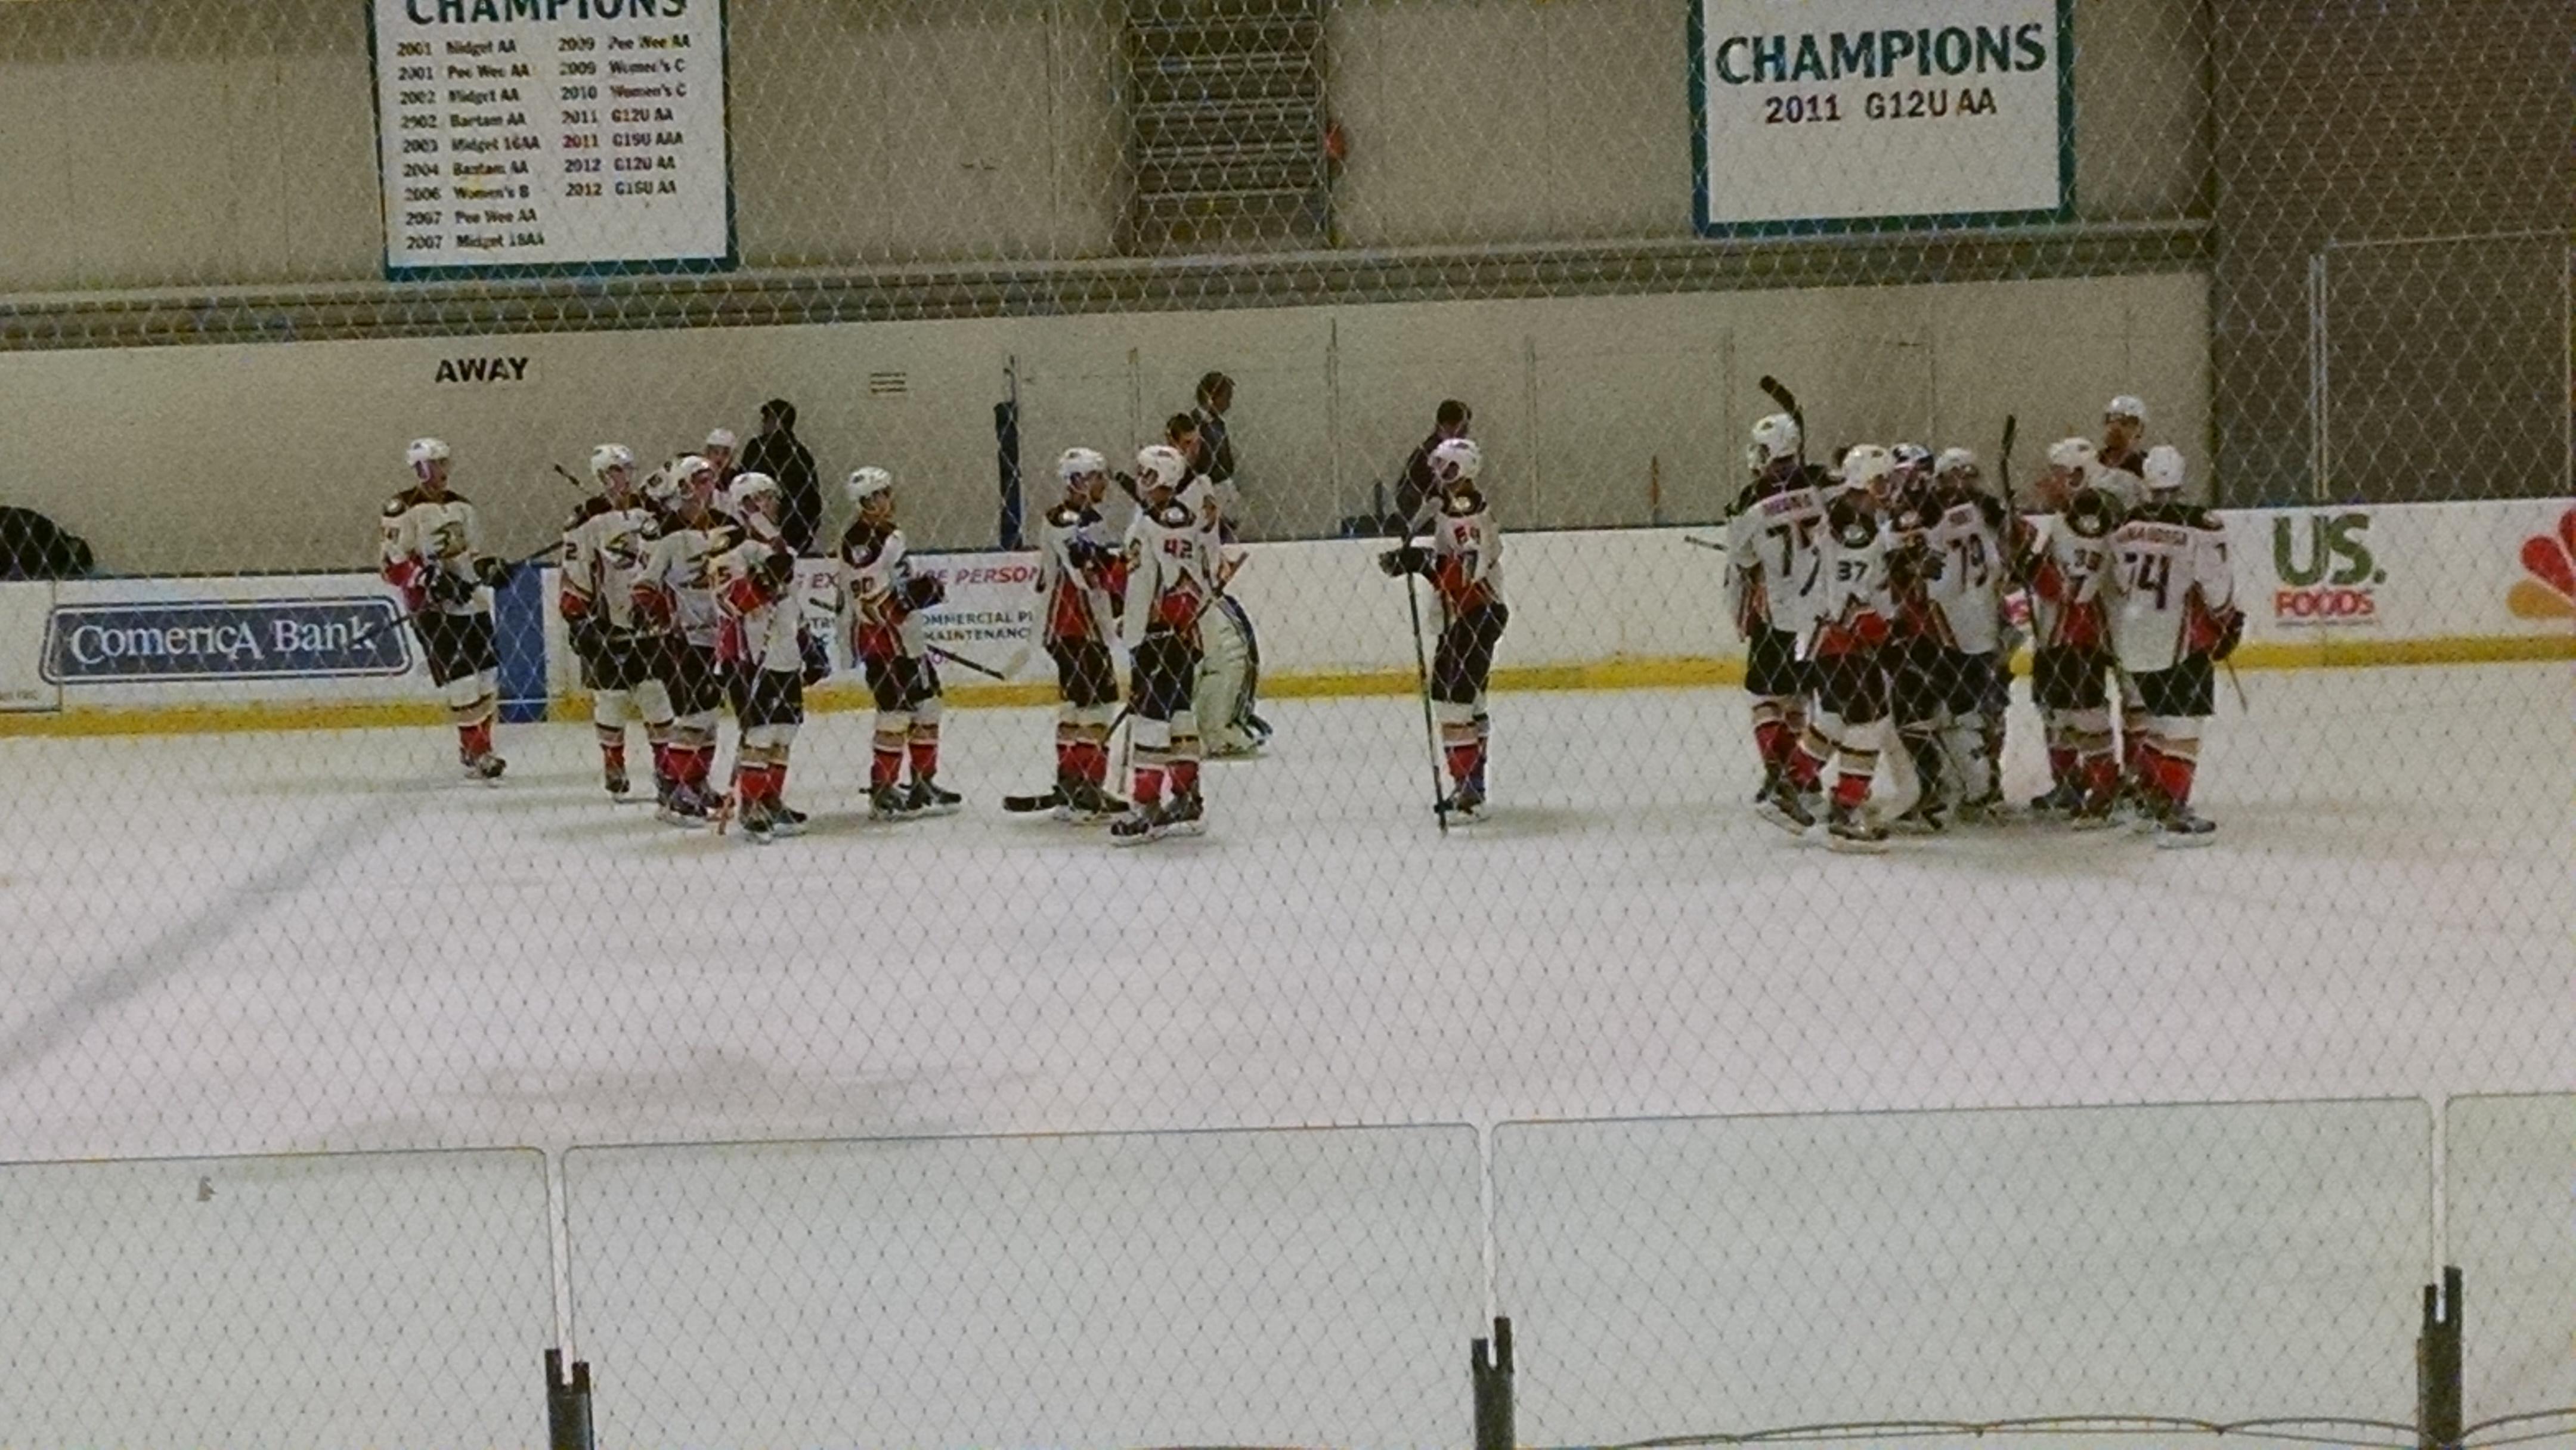 The Ducks rookies celebrate their win at Sharks Ice-San Jose on Sunday, September 13.